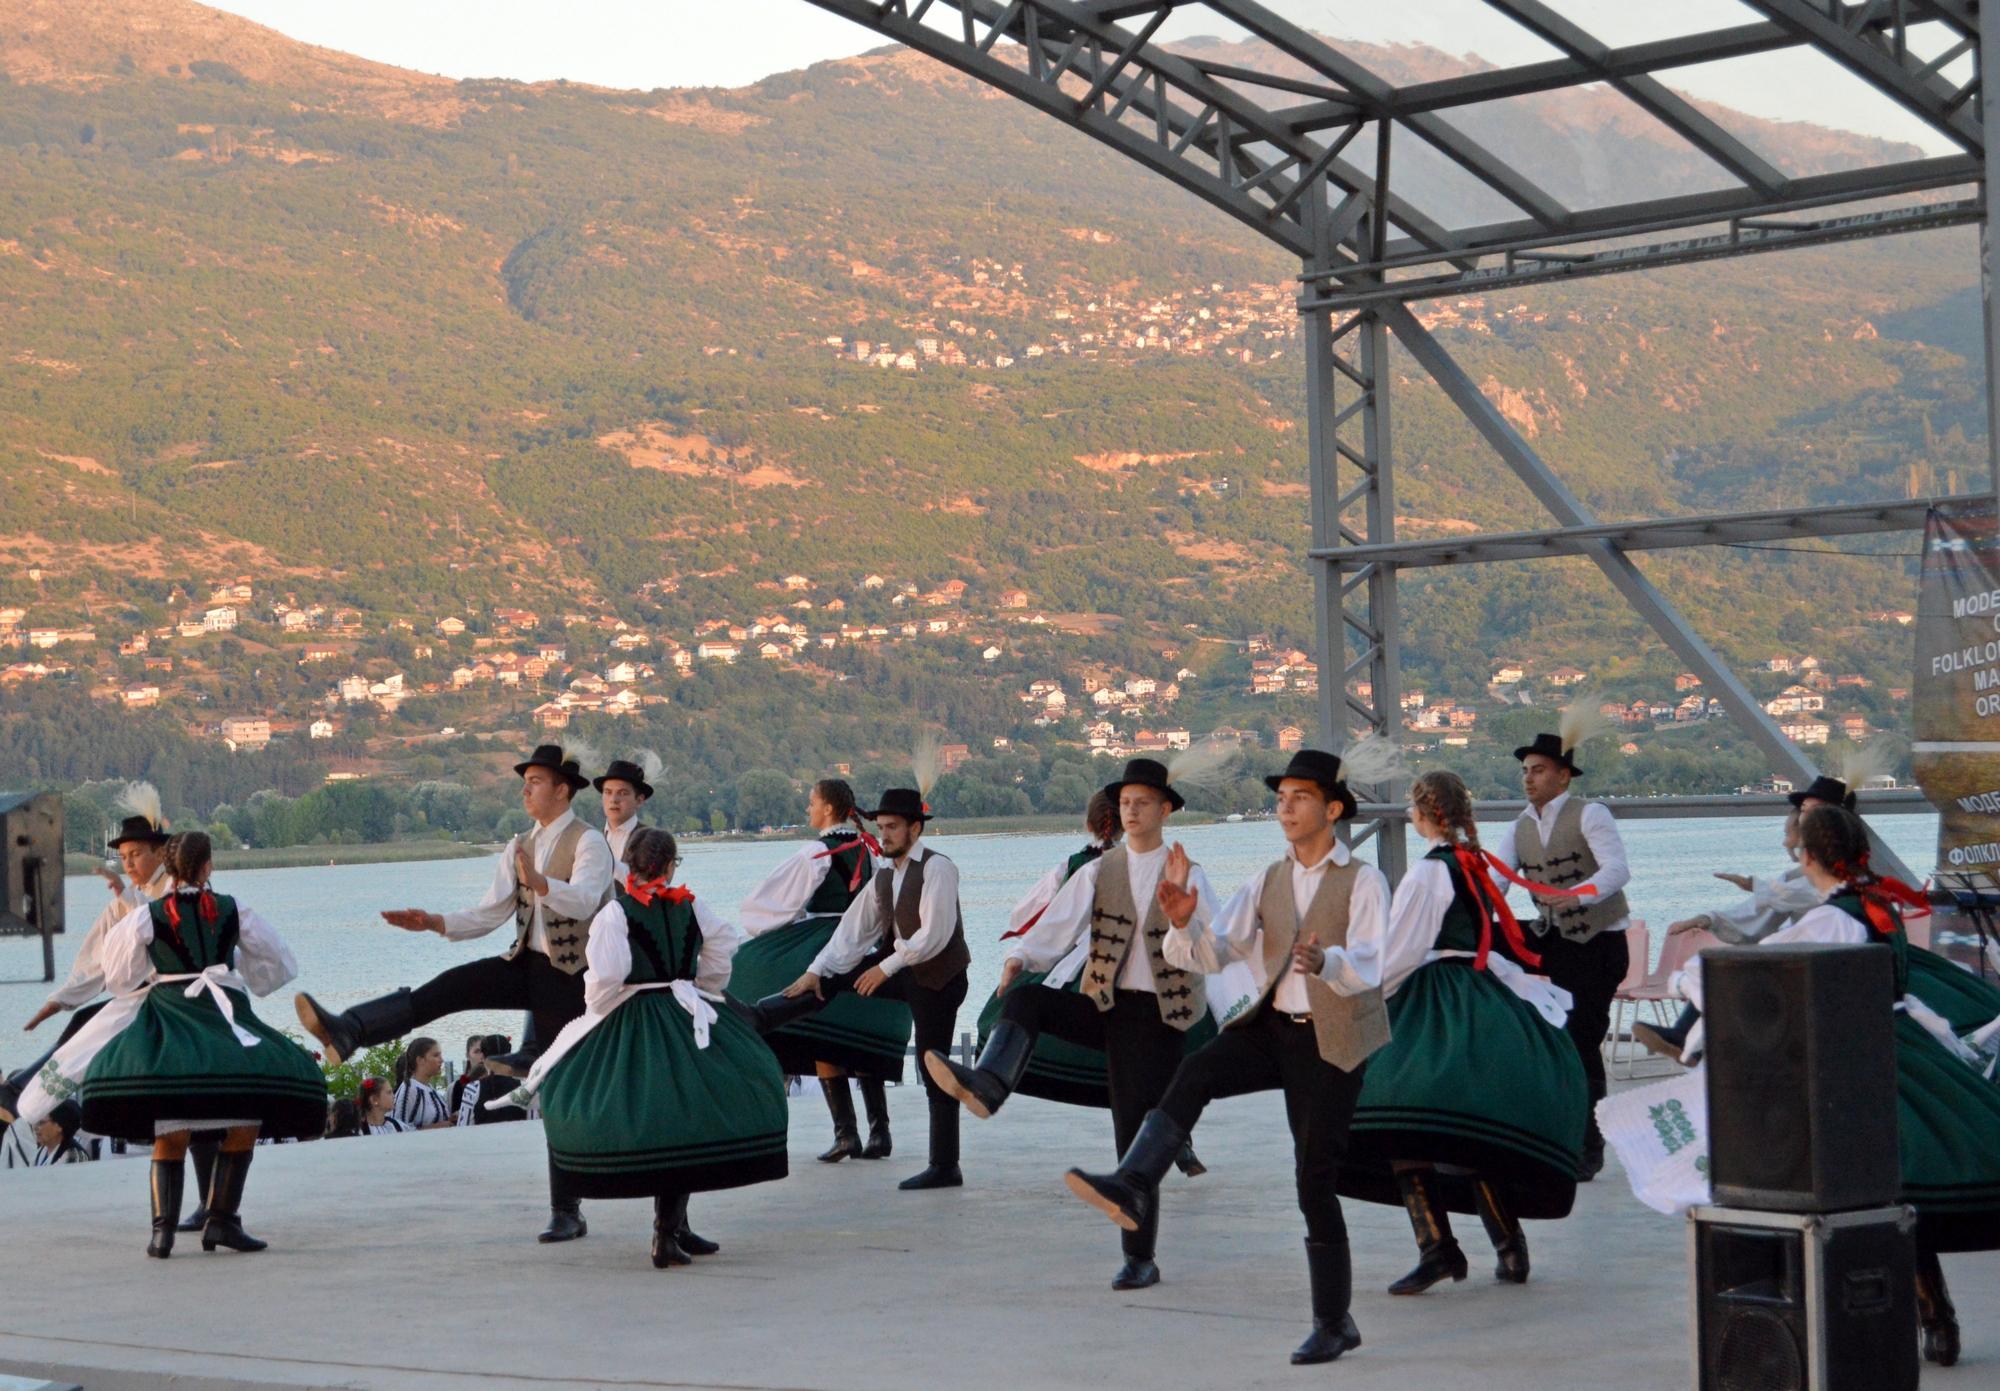 Ansamblul Búzavirág a făcut spectacol în Macedonia